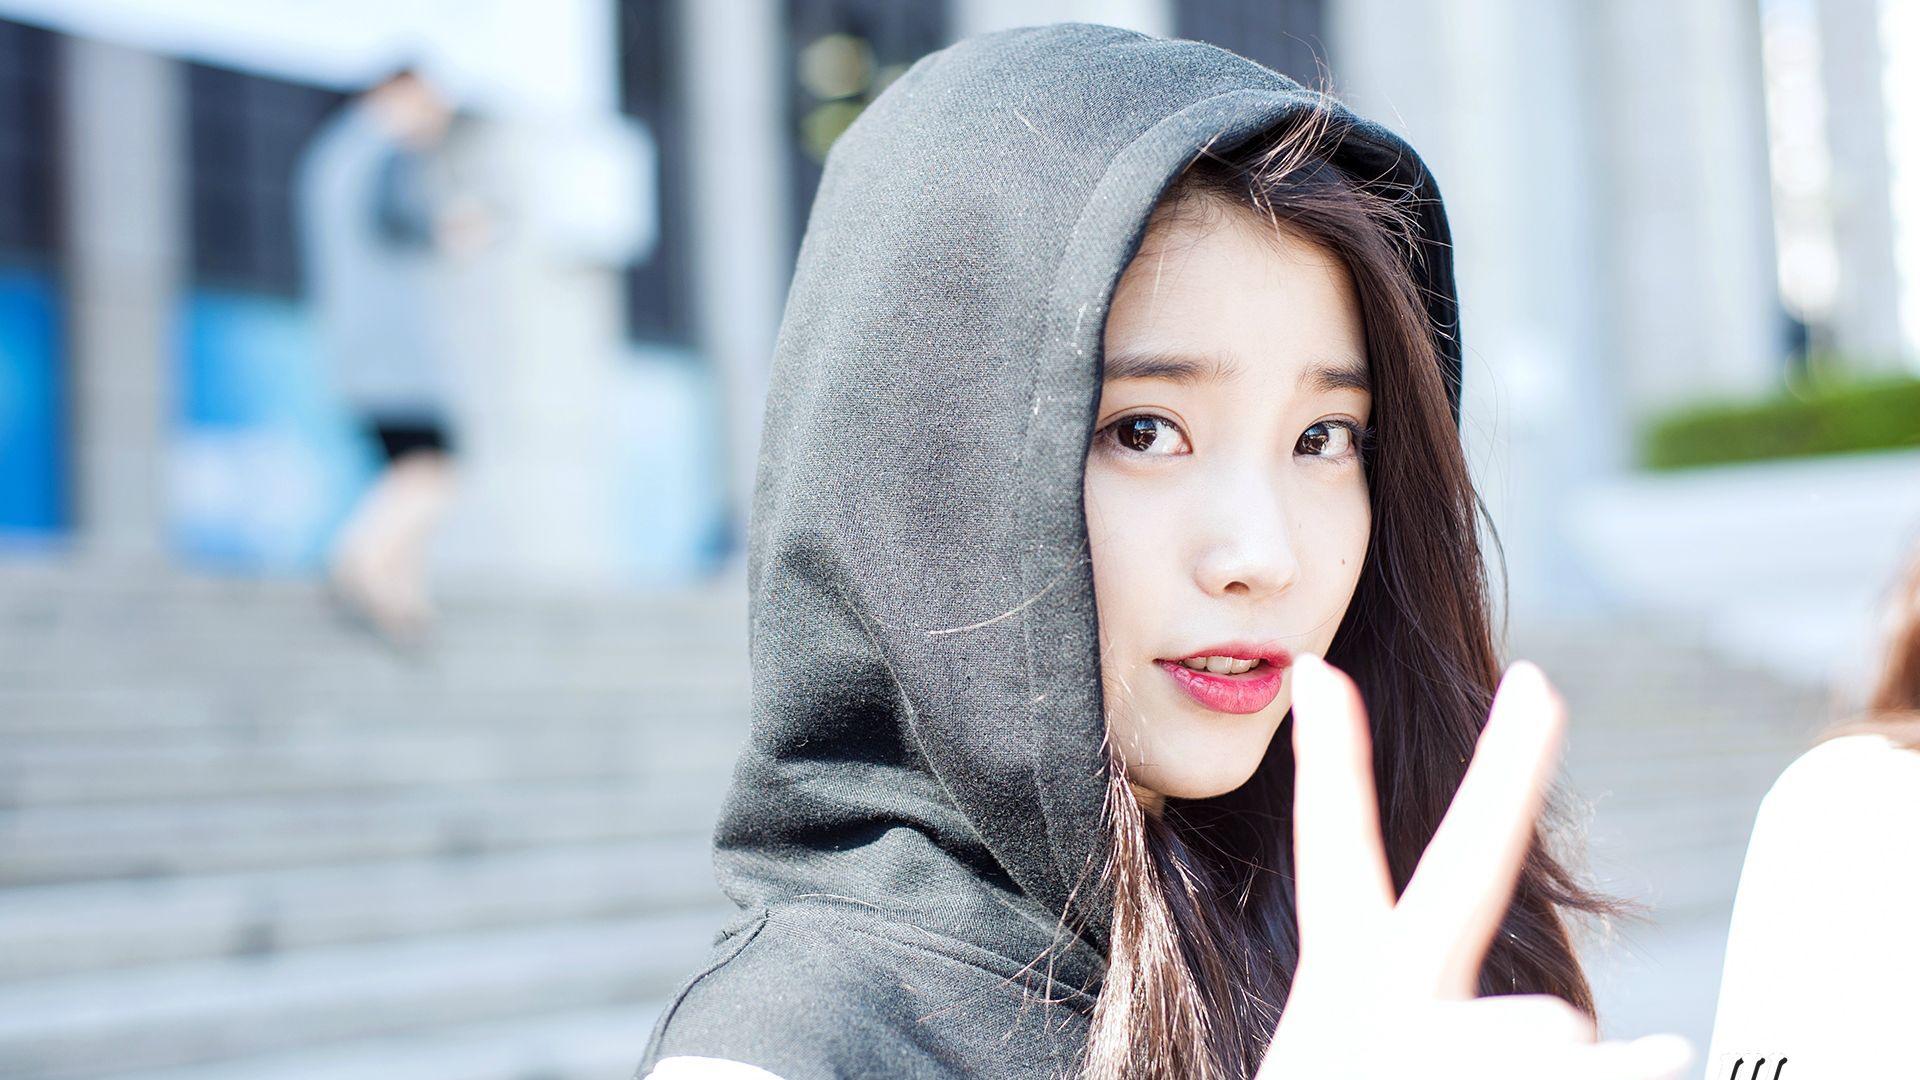 Iu, Singer, Actress, Korean, Asian, Girls, Celebrities, - Lee Ji Eun Wallpaper Hd , HD Wallpaper & Backgrounds